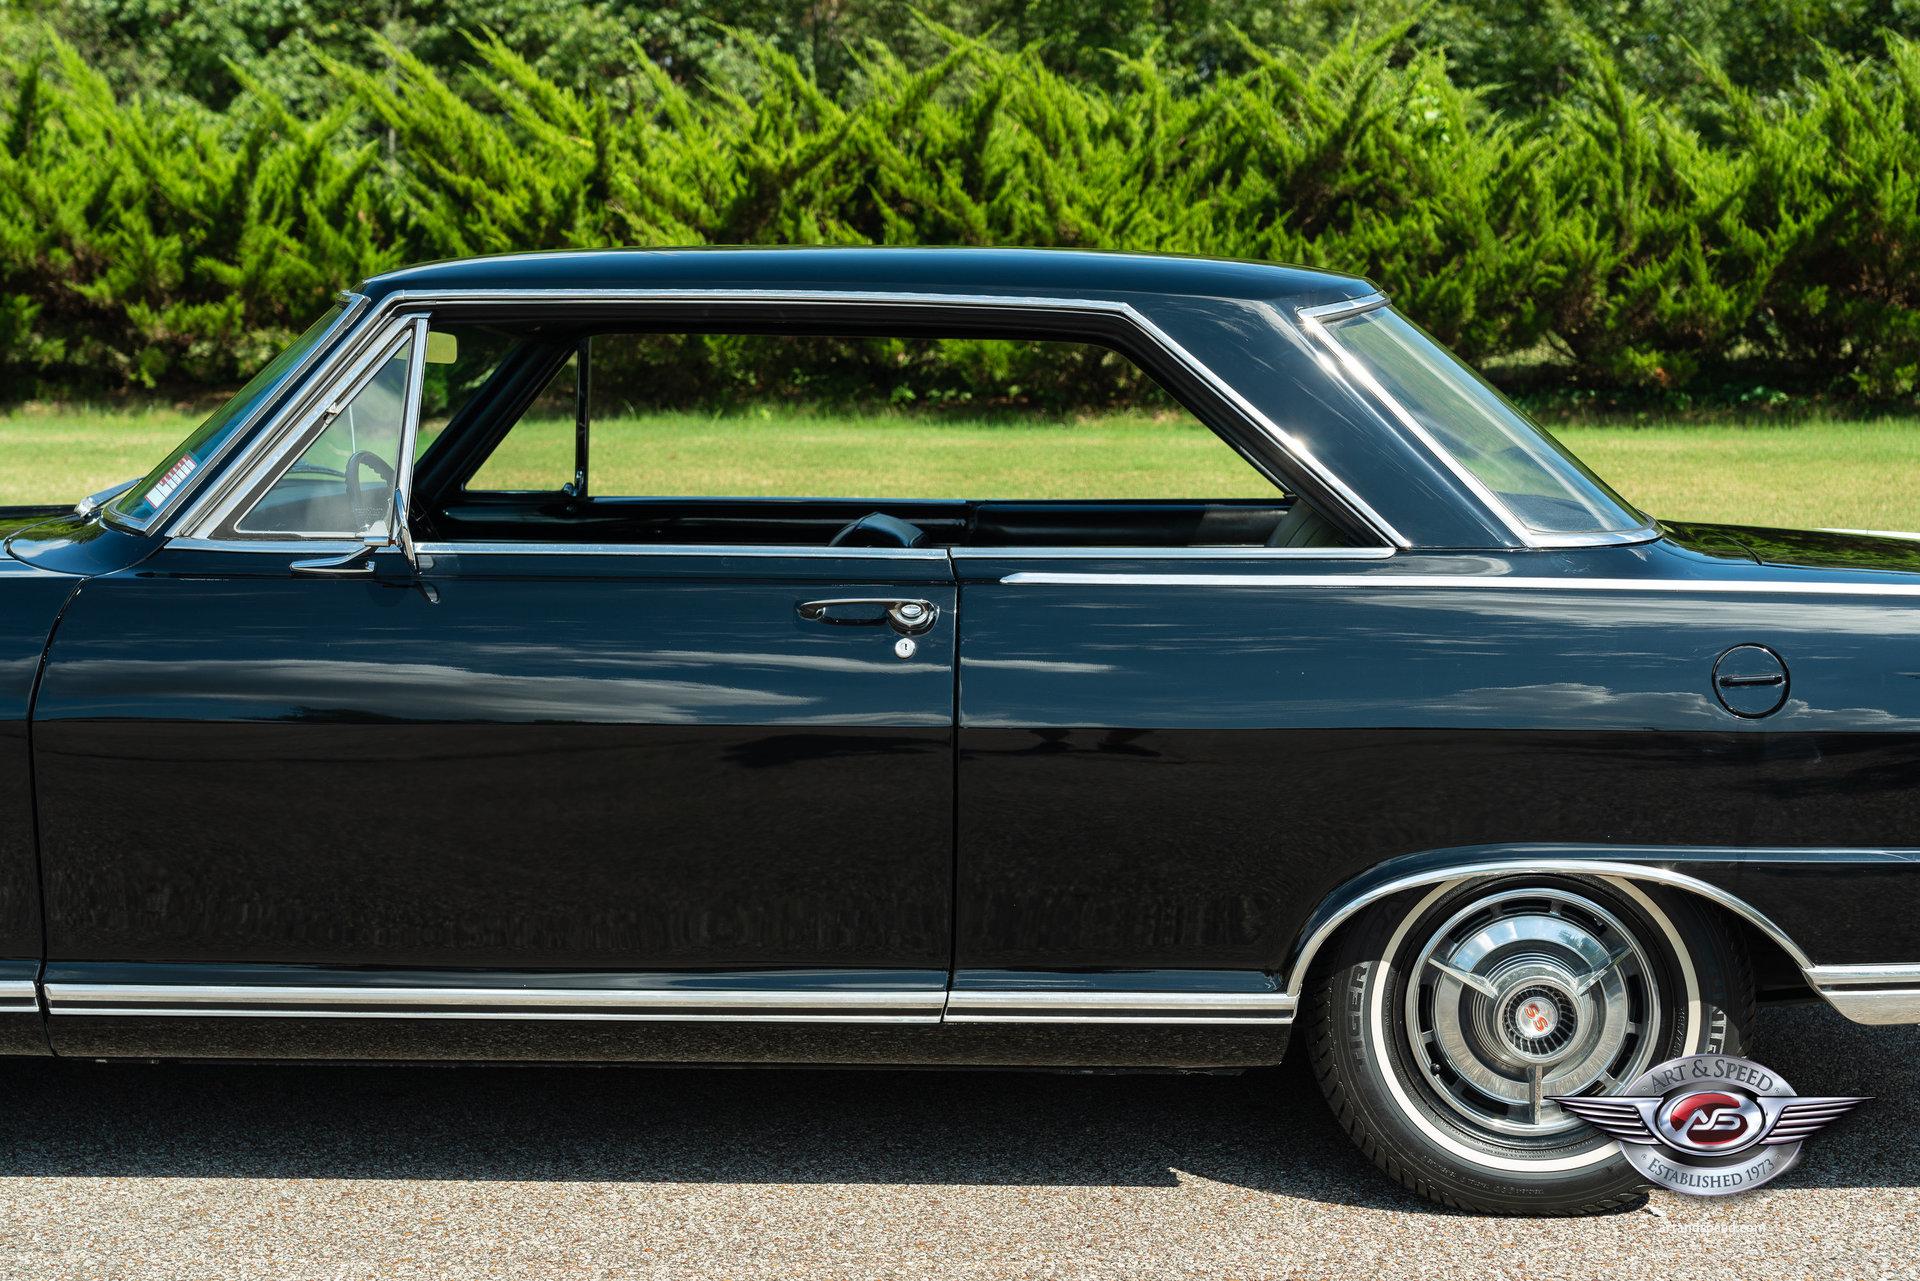 1965 Chevrolet Chevy Ii Nova Ss For Sale 101769 Mcg Headlight Wiring